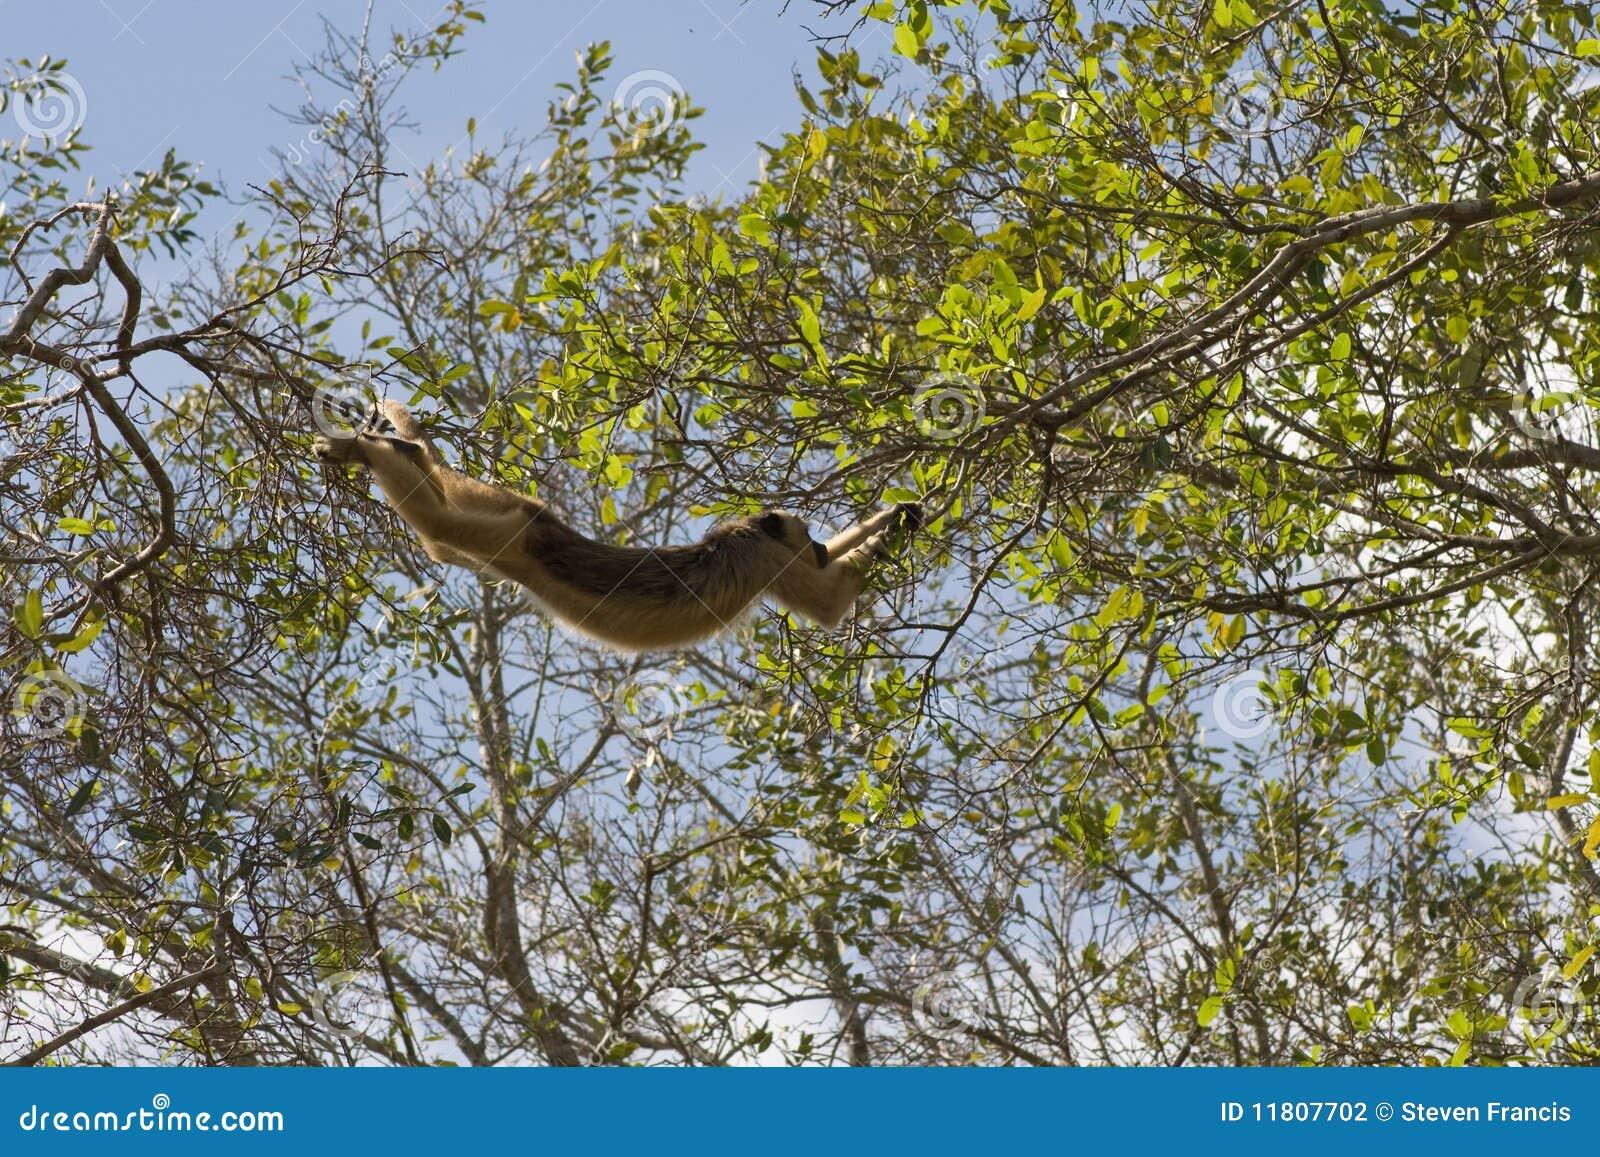 Schwingsummerfallhammer im pantanal, Brasilien